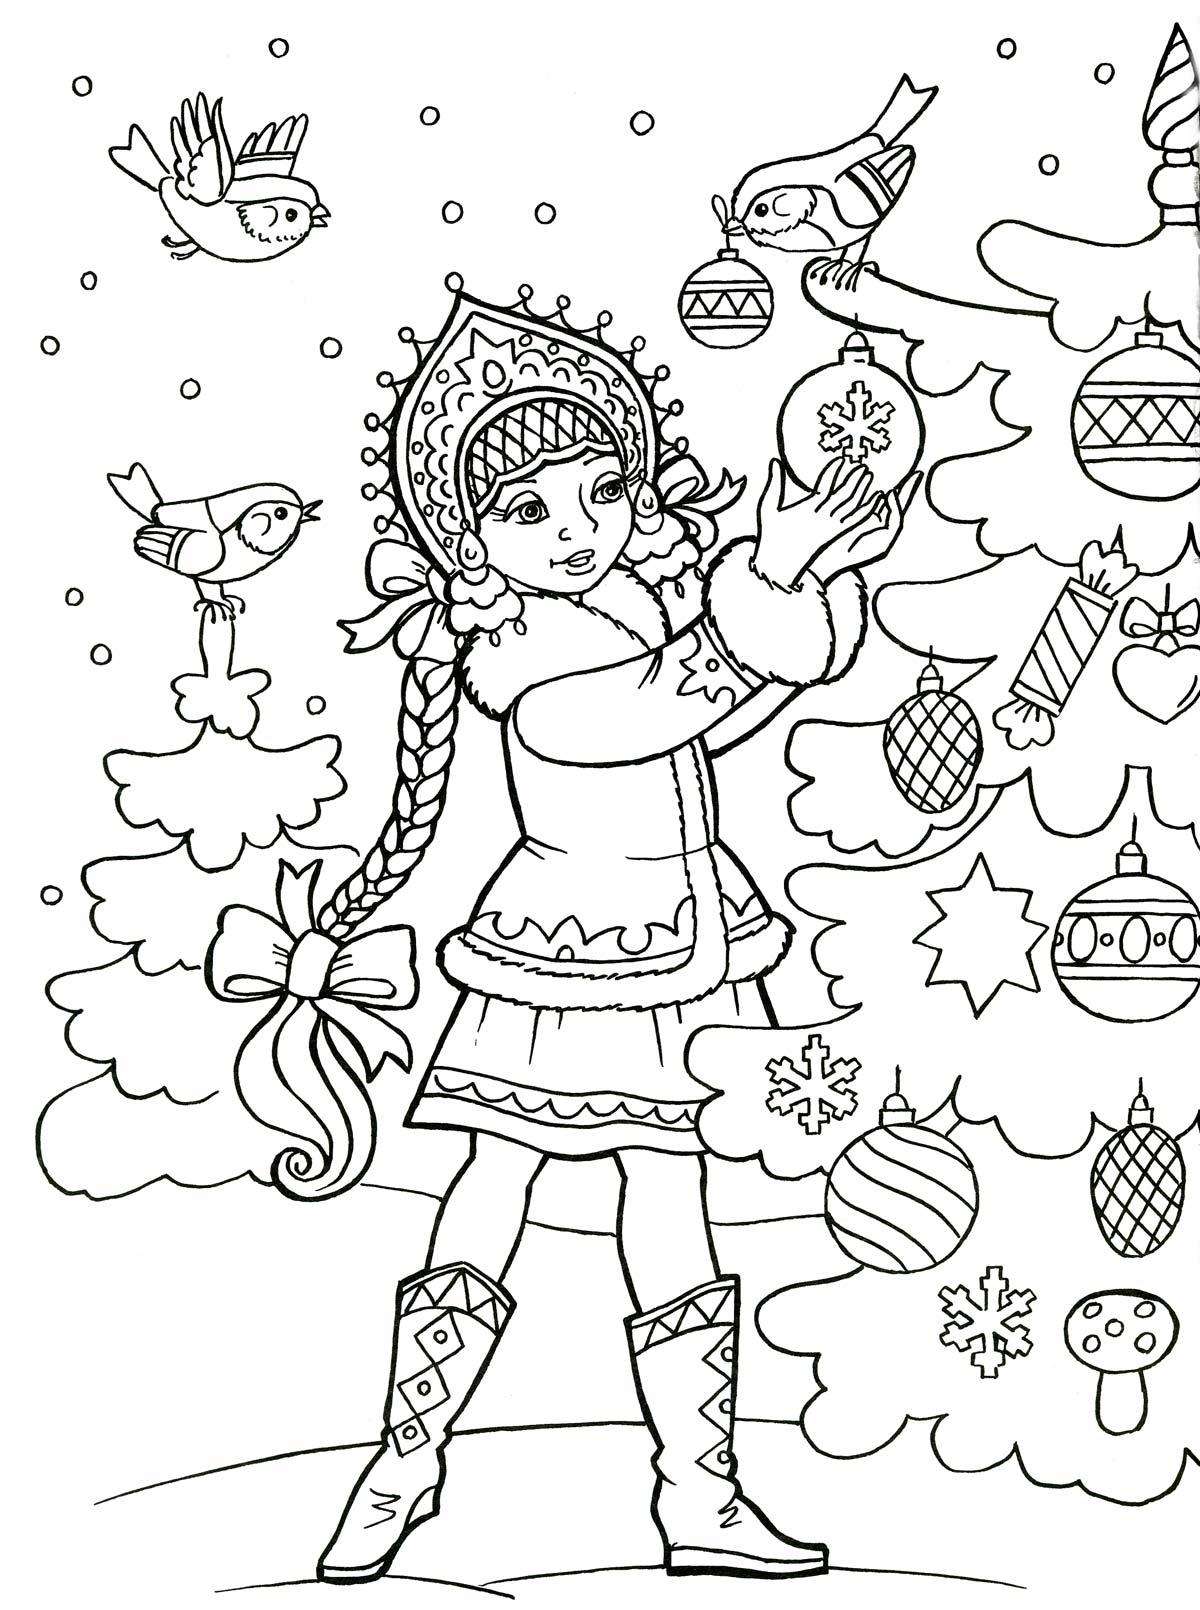 Снегурочка с птичками наряжает елку Раскраски зимушка зима